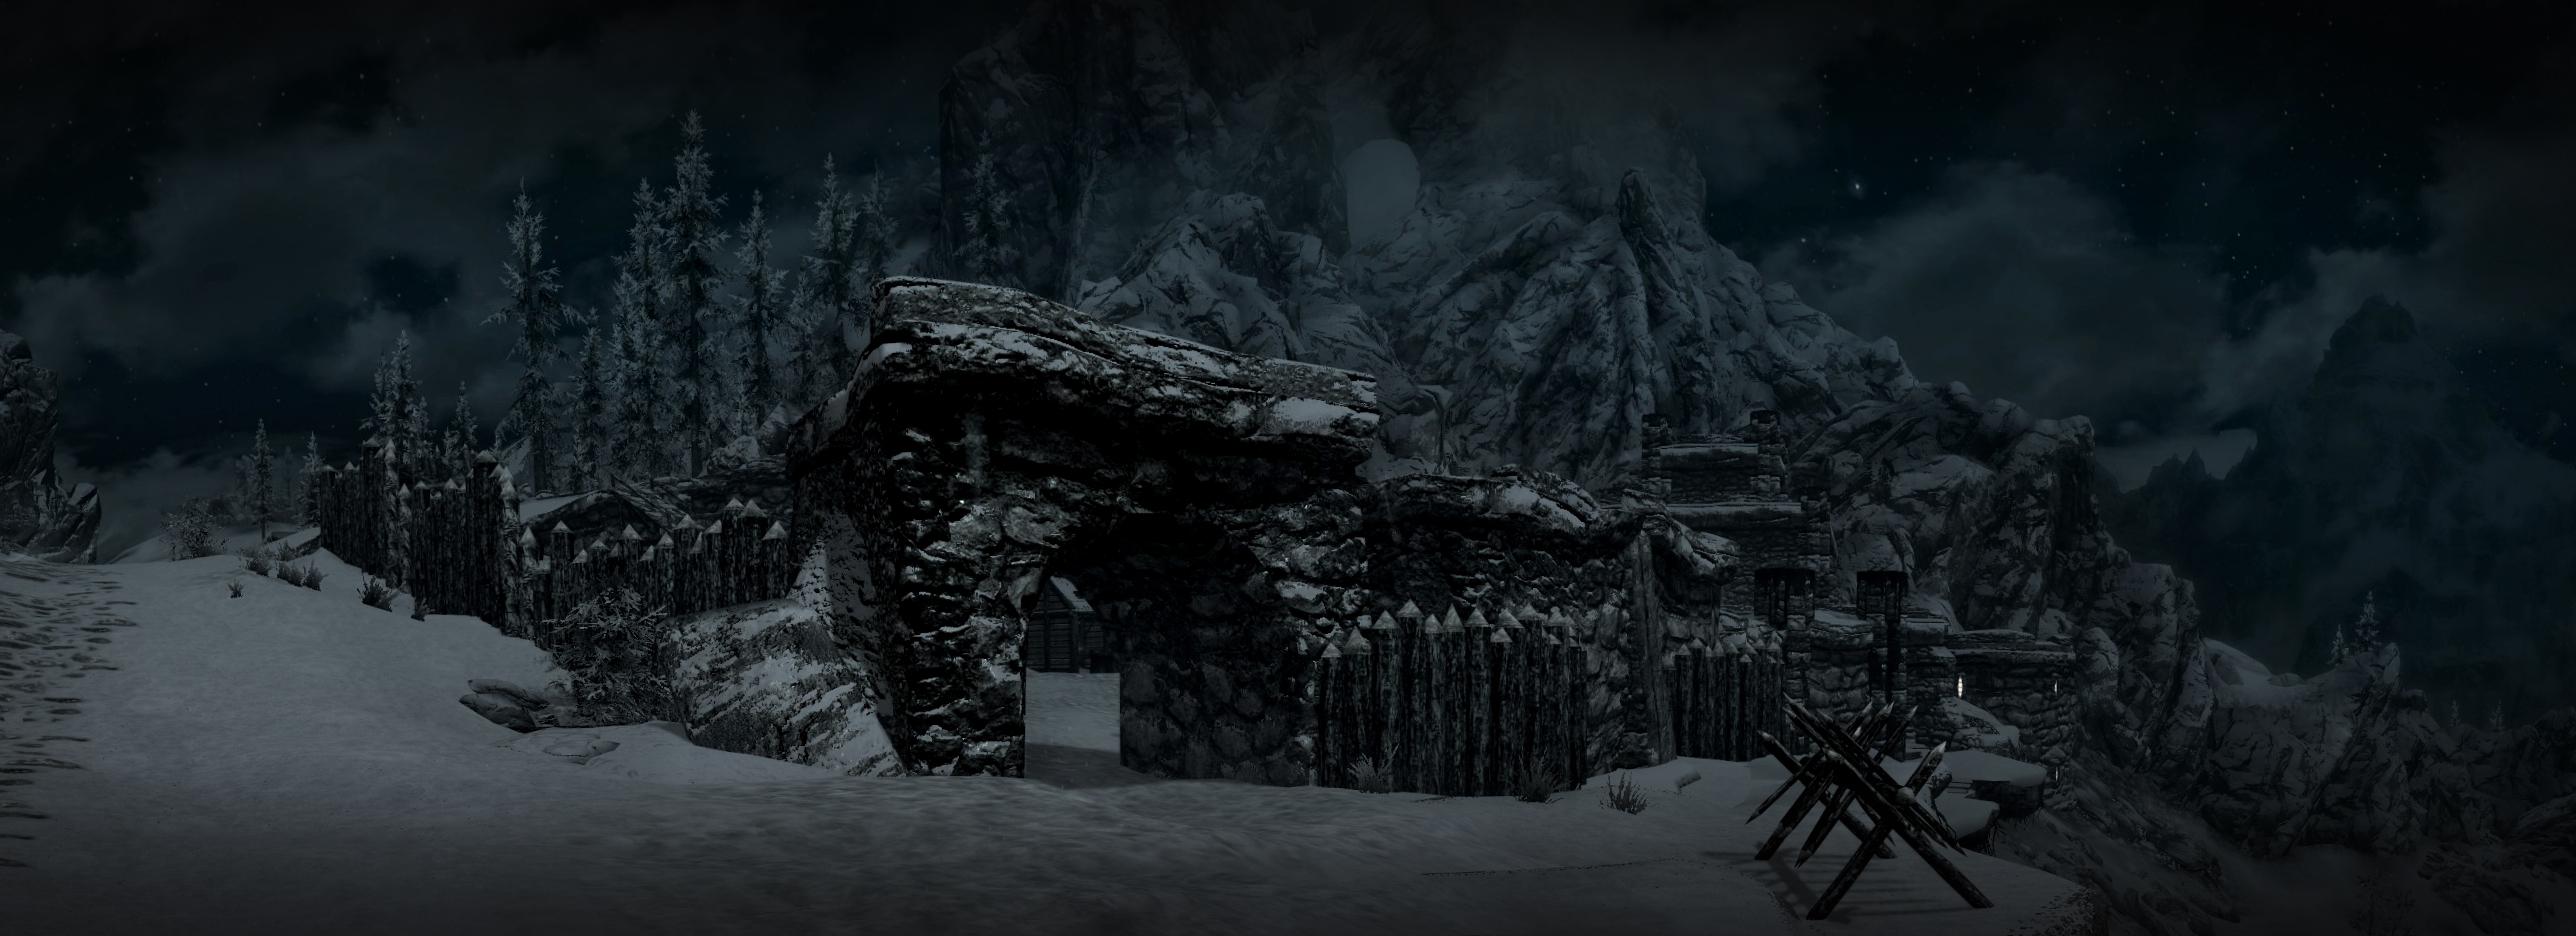 12 Форт Кастав 2 (5 фото)